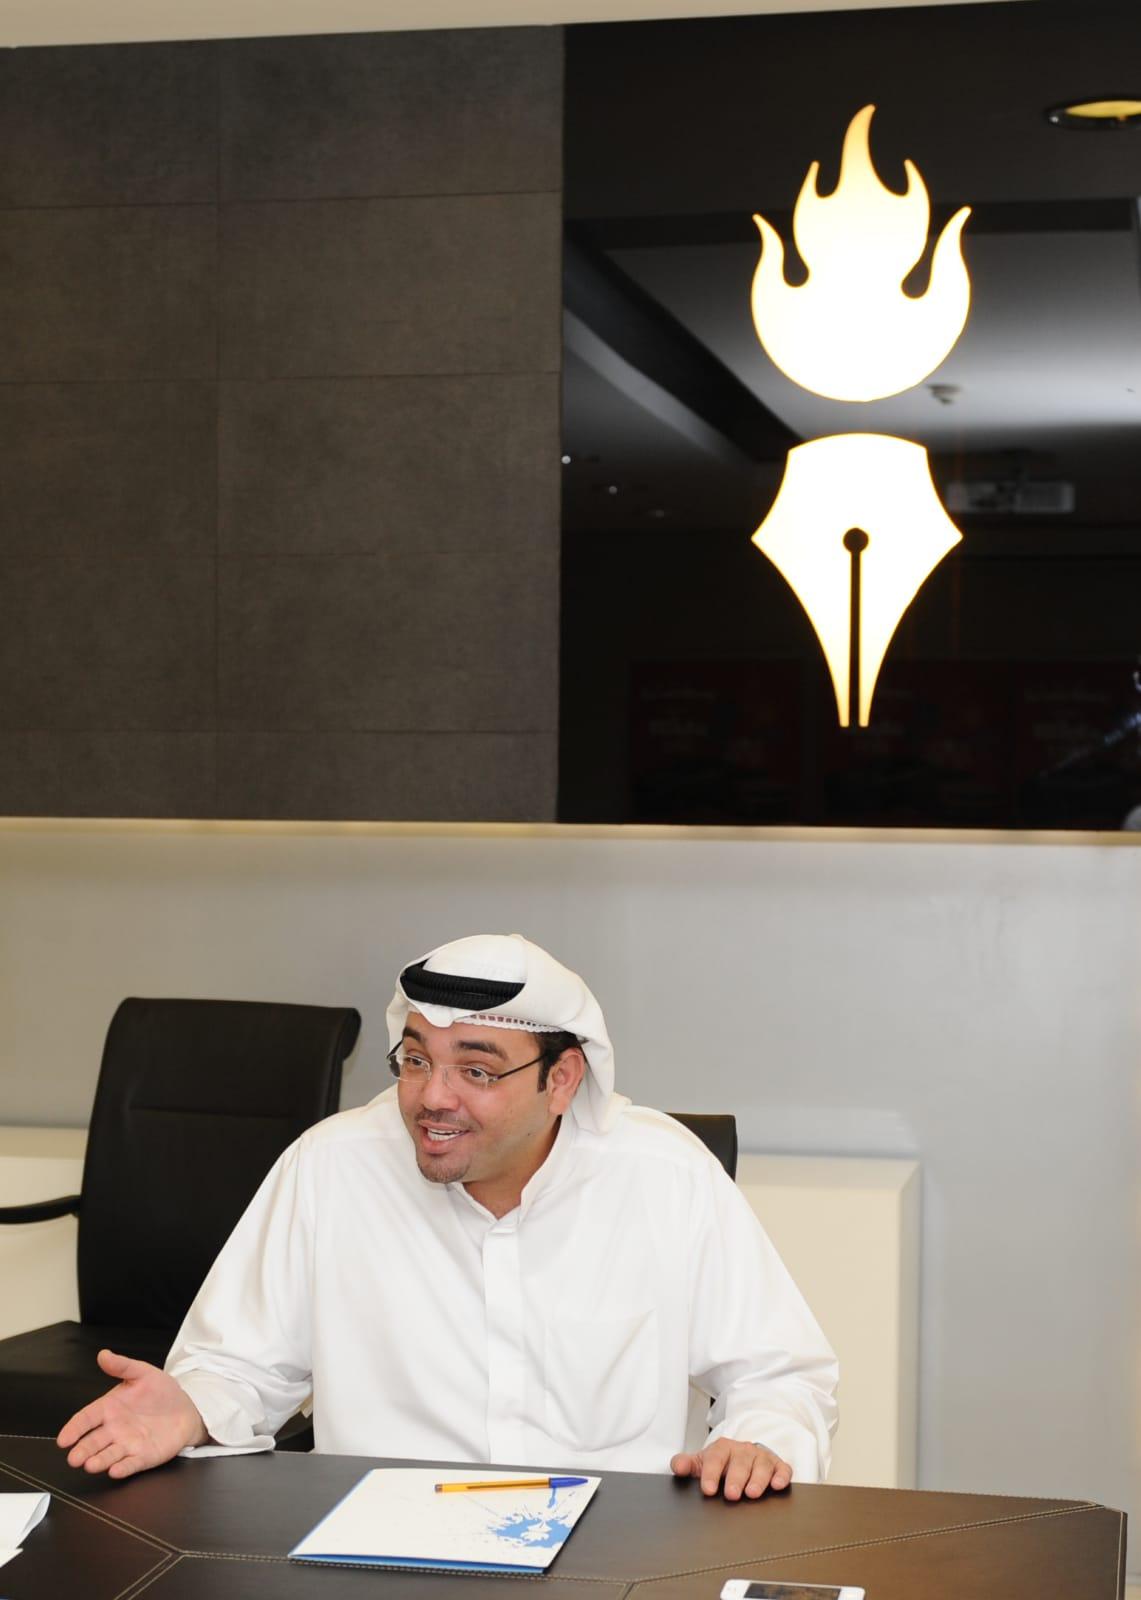 IMG 20190801 WA0001 - يوسف خالد المرزوق : والدي  أًصر على اصدار صحيفة الأنباء لتكون صوت كل كويتي أُثناء الغزو